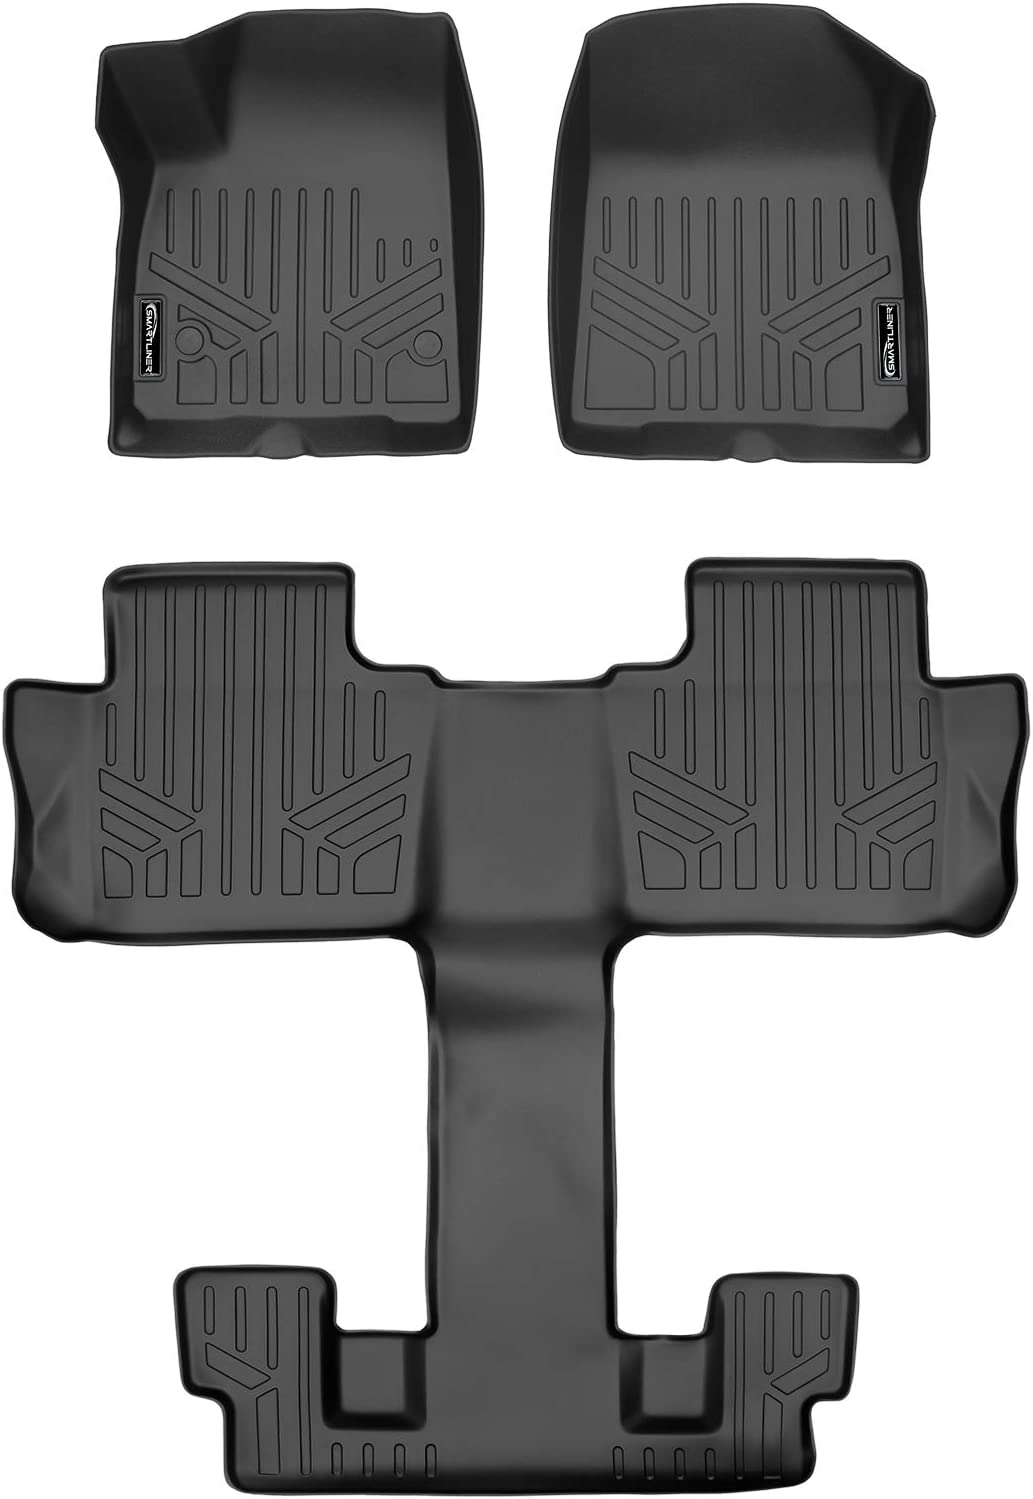 MAX LINER A0230 Custom Fit Floor Mats 1st Row Liner Set Black for 2017-2019 GMC Acadia